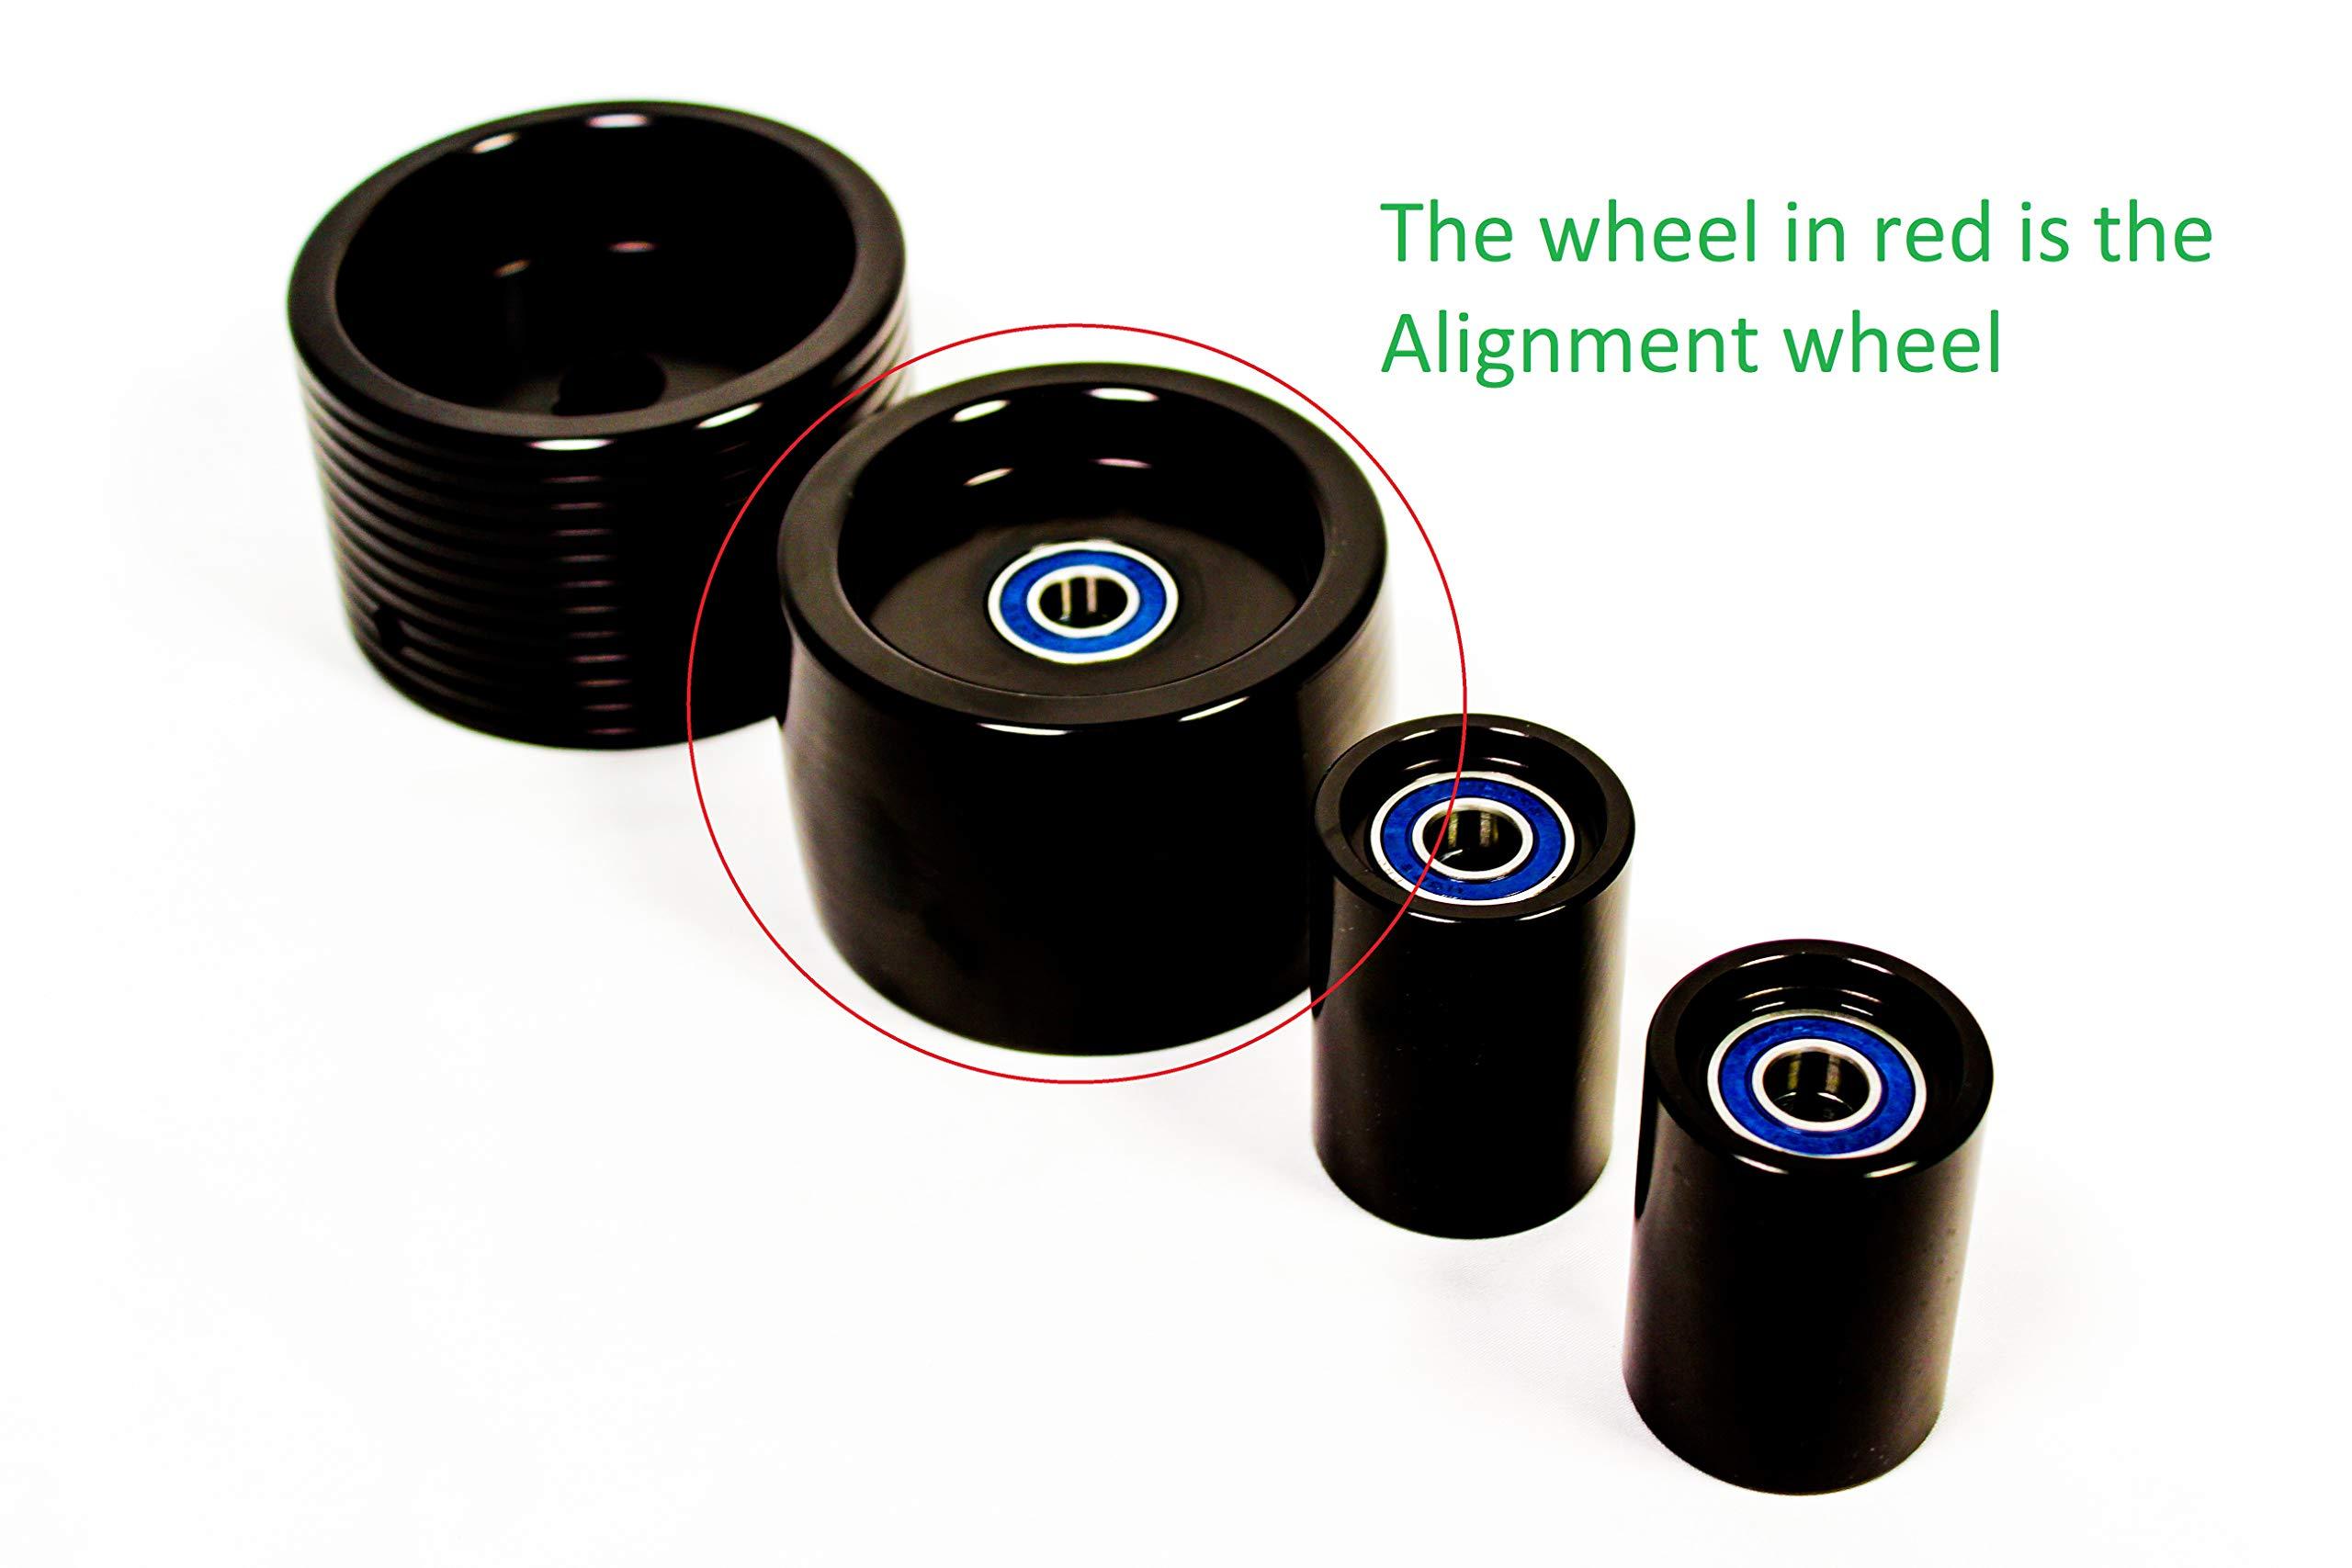 Belt Grinder Alignment Wheel WEAR RESISTANT WHEEL MADE IN USA